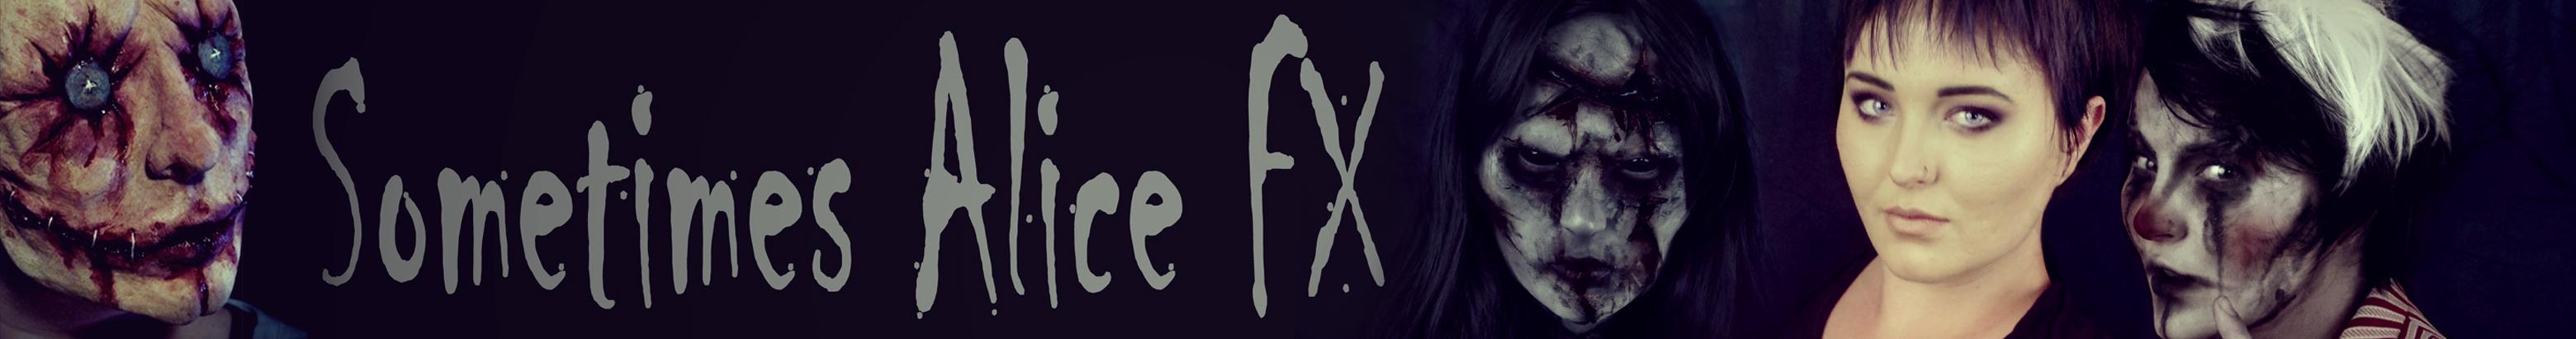 Sometimes Alice FX